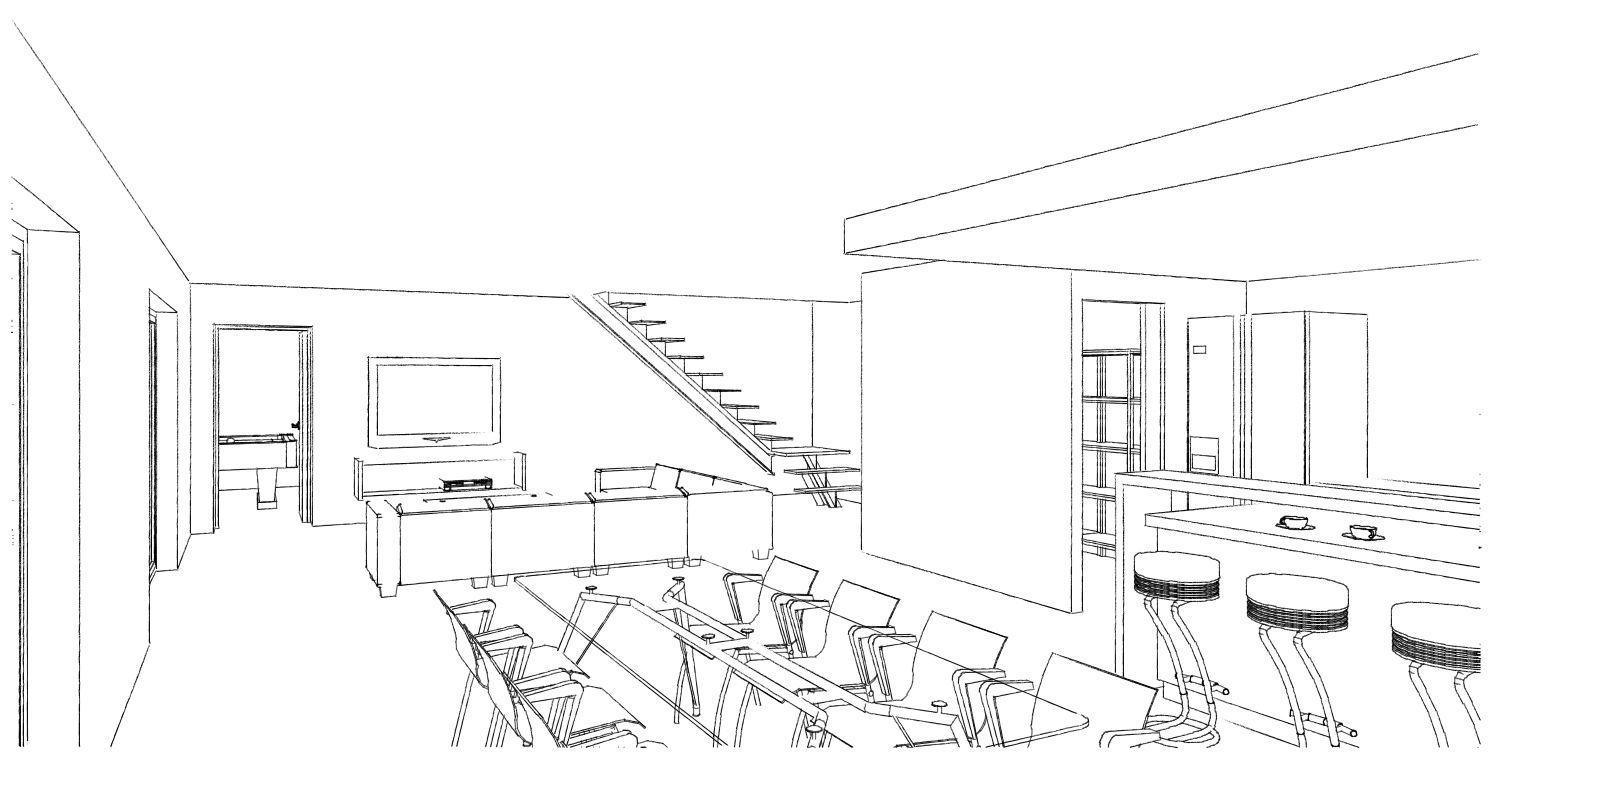 permis de construire architecte Lille 14